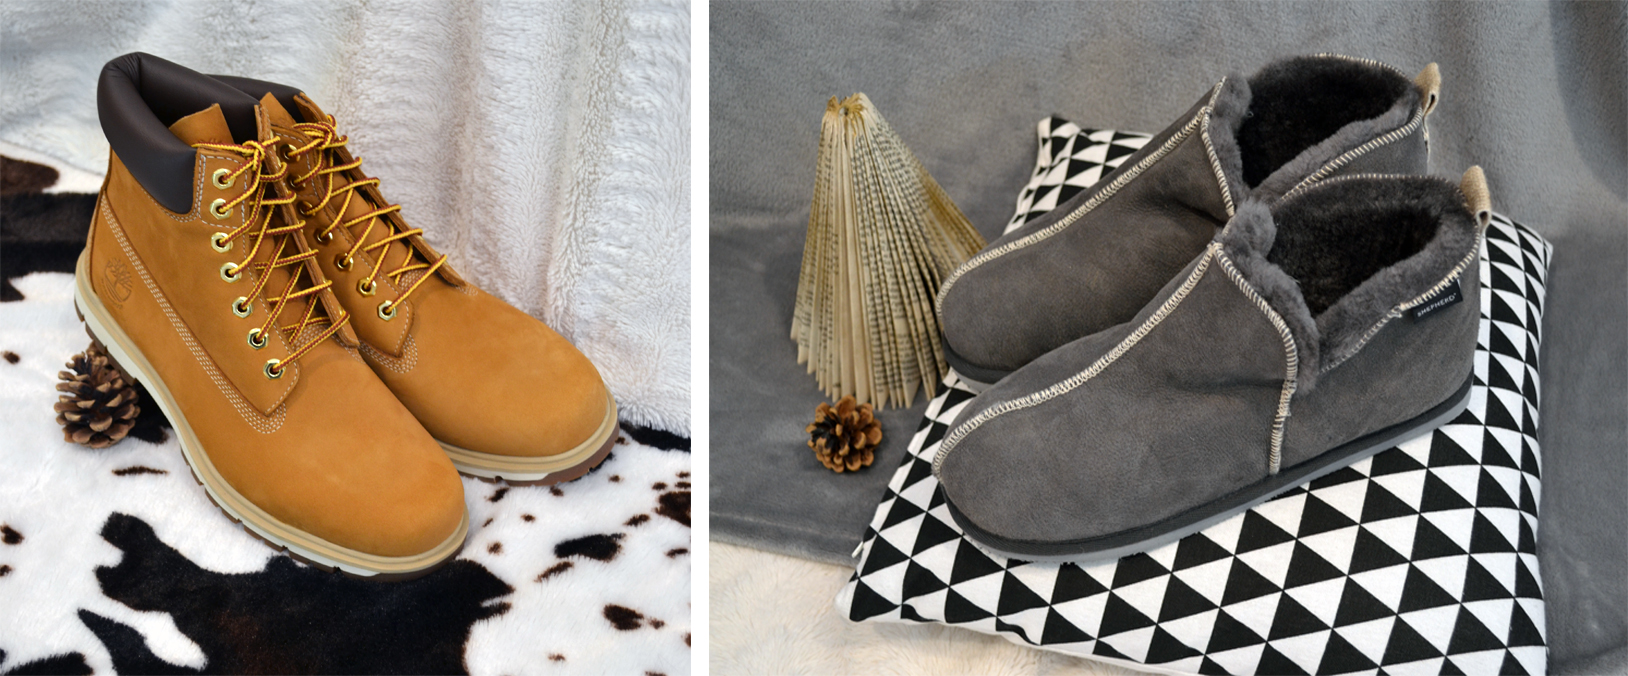 chaussuresonline-idéescadeaux-papa-noël-hiver-fête-cocooning-chaud-sheperdofsweden-chaussures-chaussons-timberland-vacances